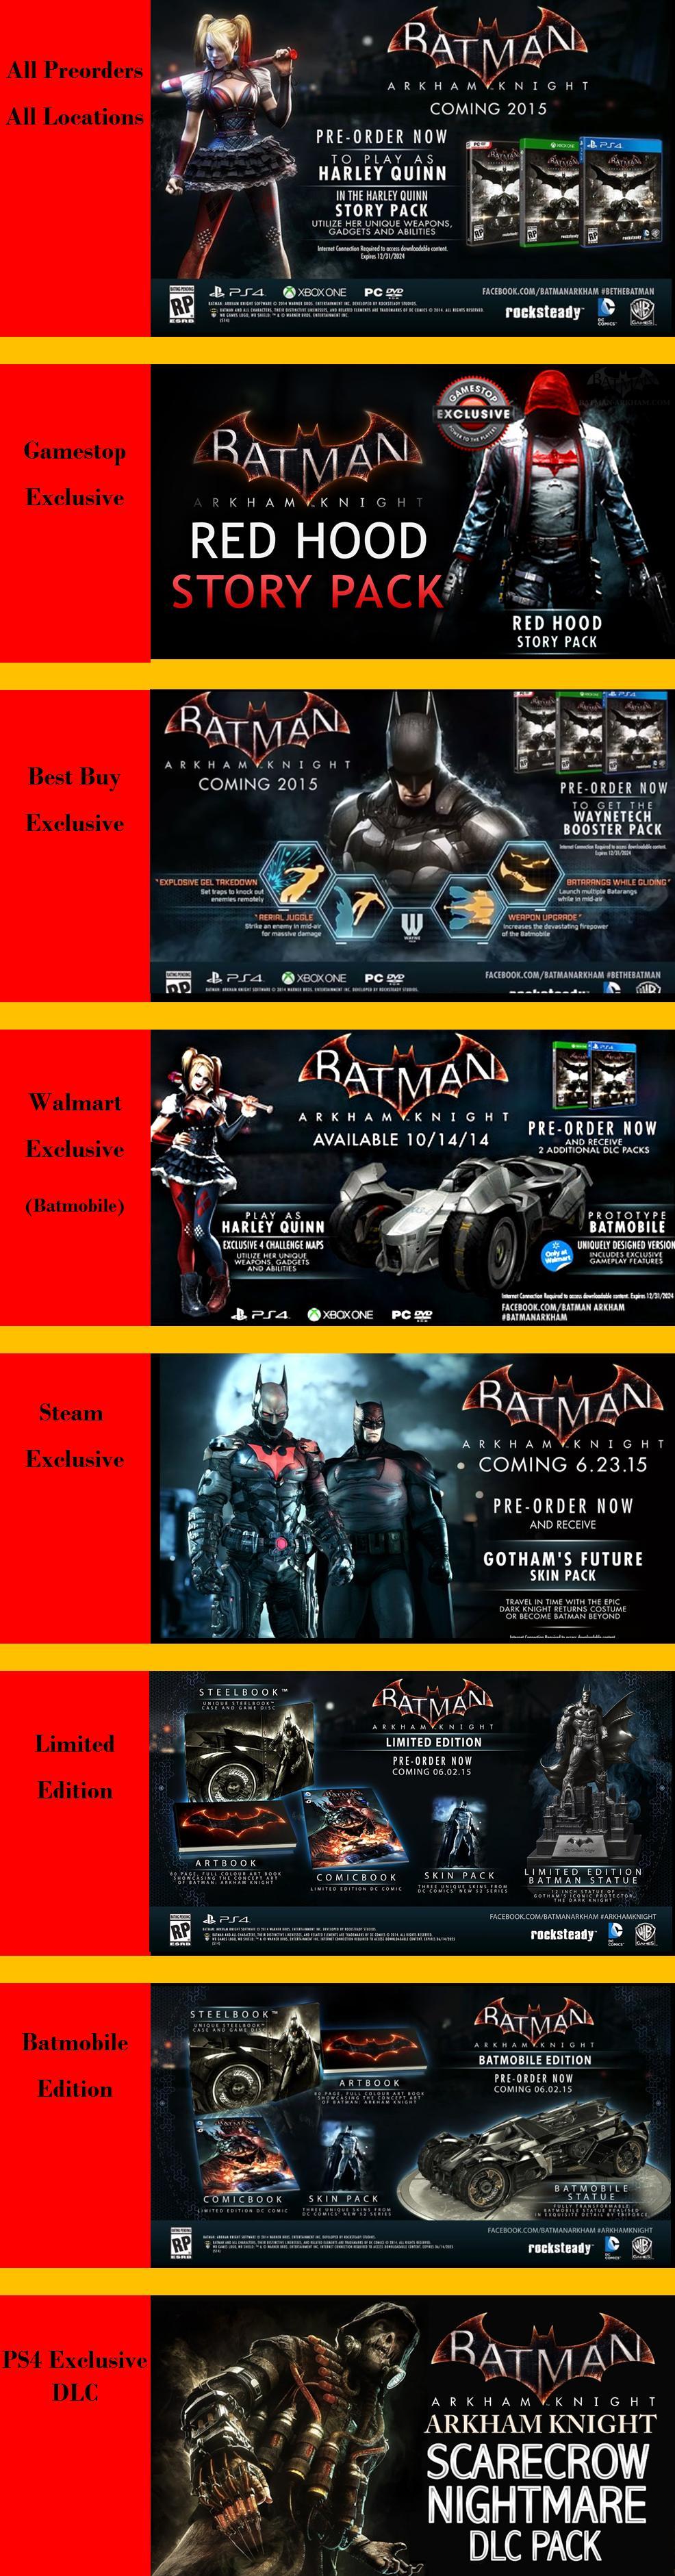 batmanpreorder